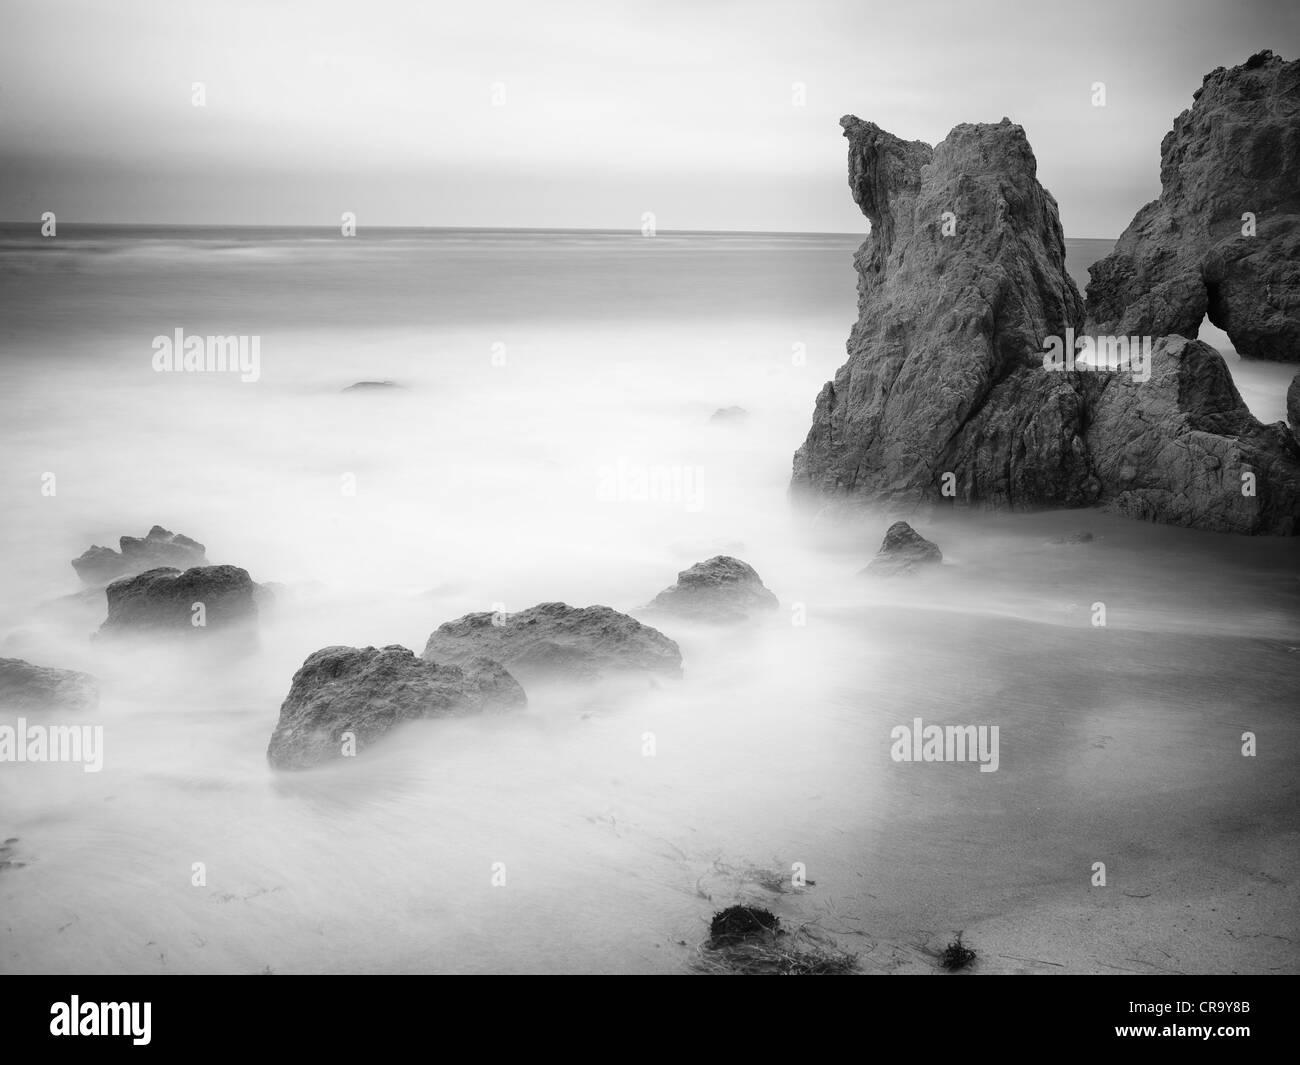 El Matador Beach Malibu California Usa Long Exposure Artistic Stock Photo Alamy